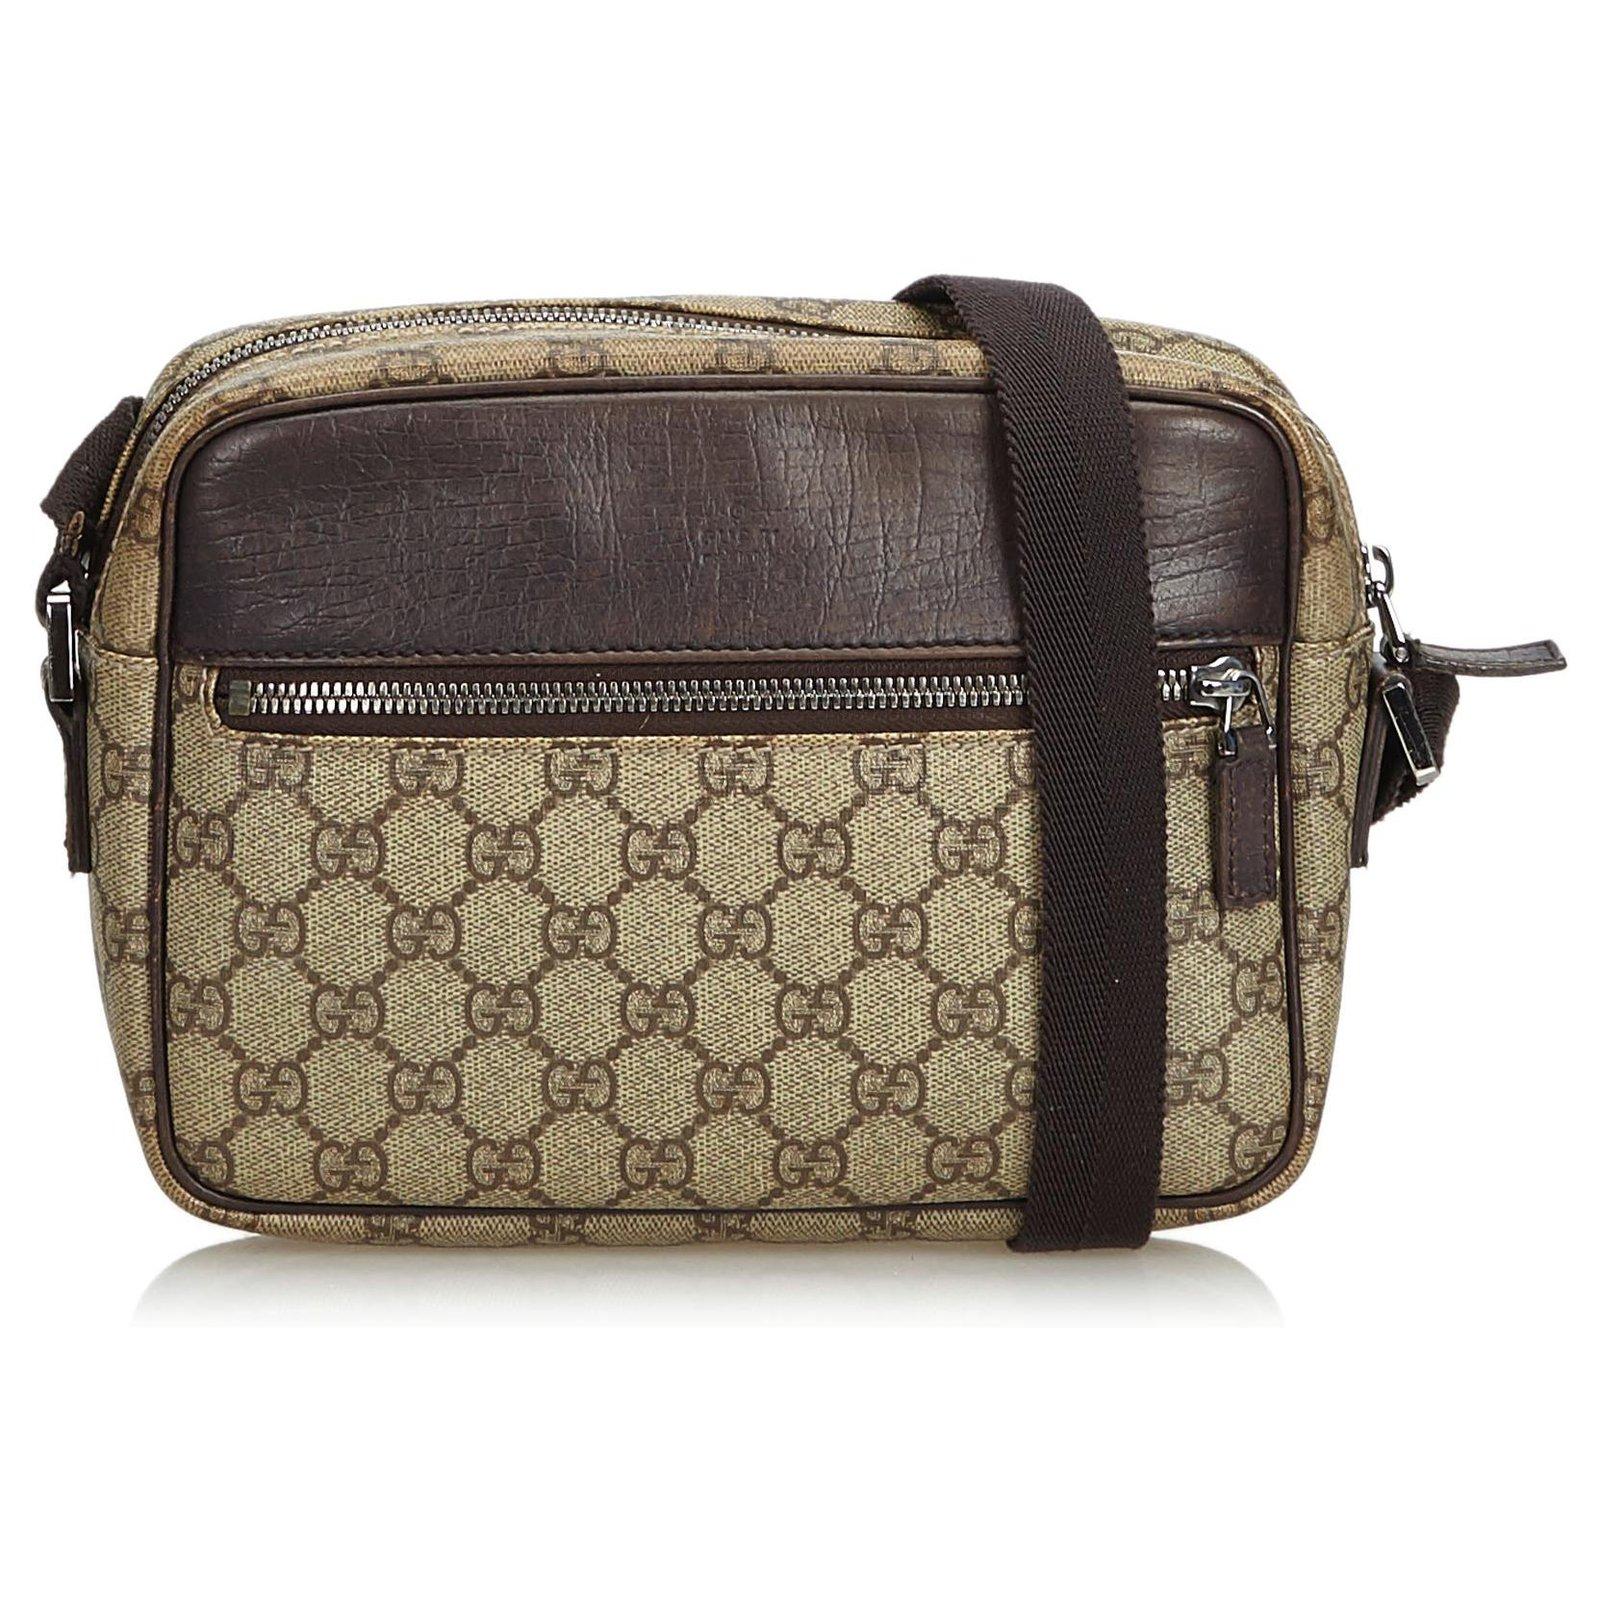 2848c93dc46 Gucci Guccissima Crossbody Bag Handbags Leather